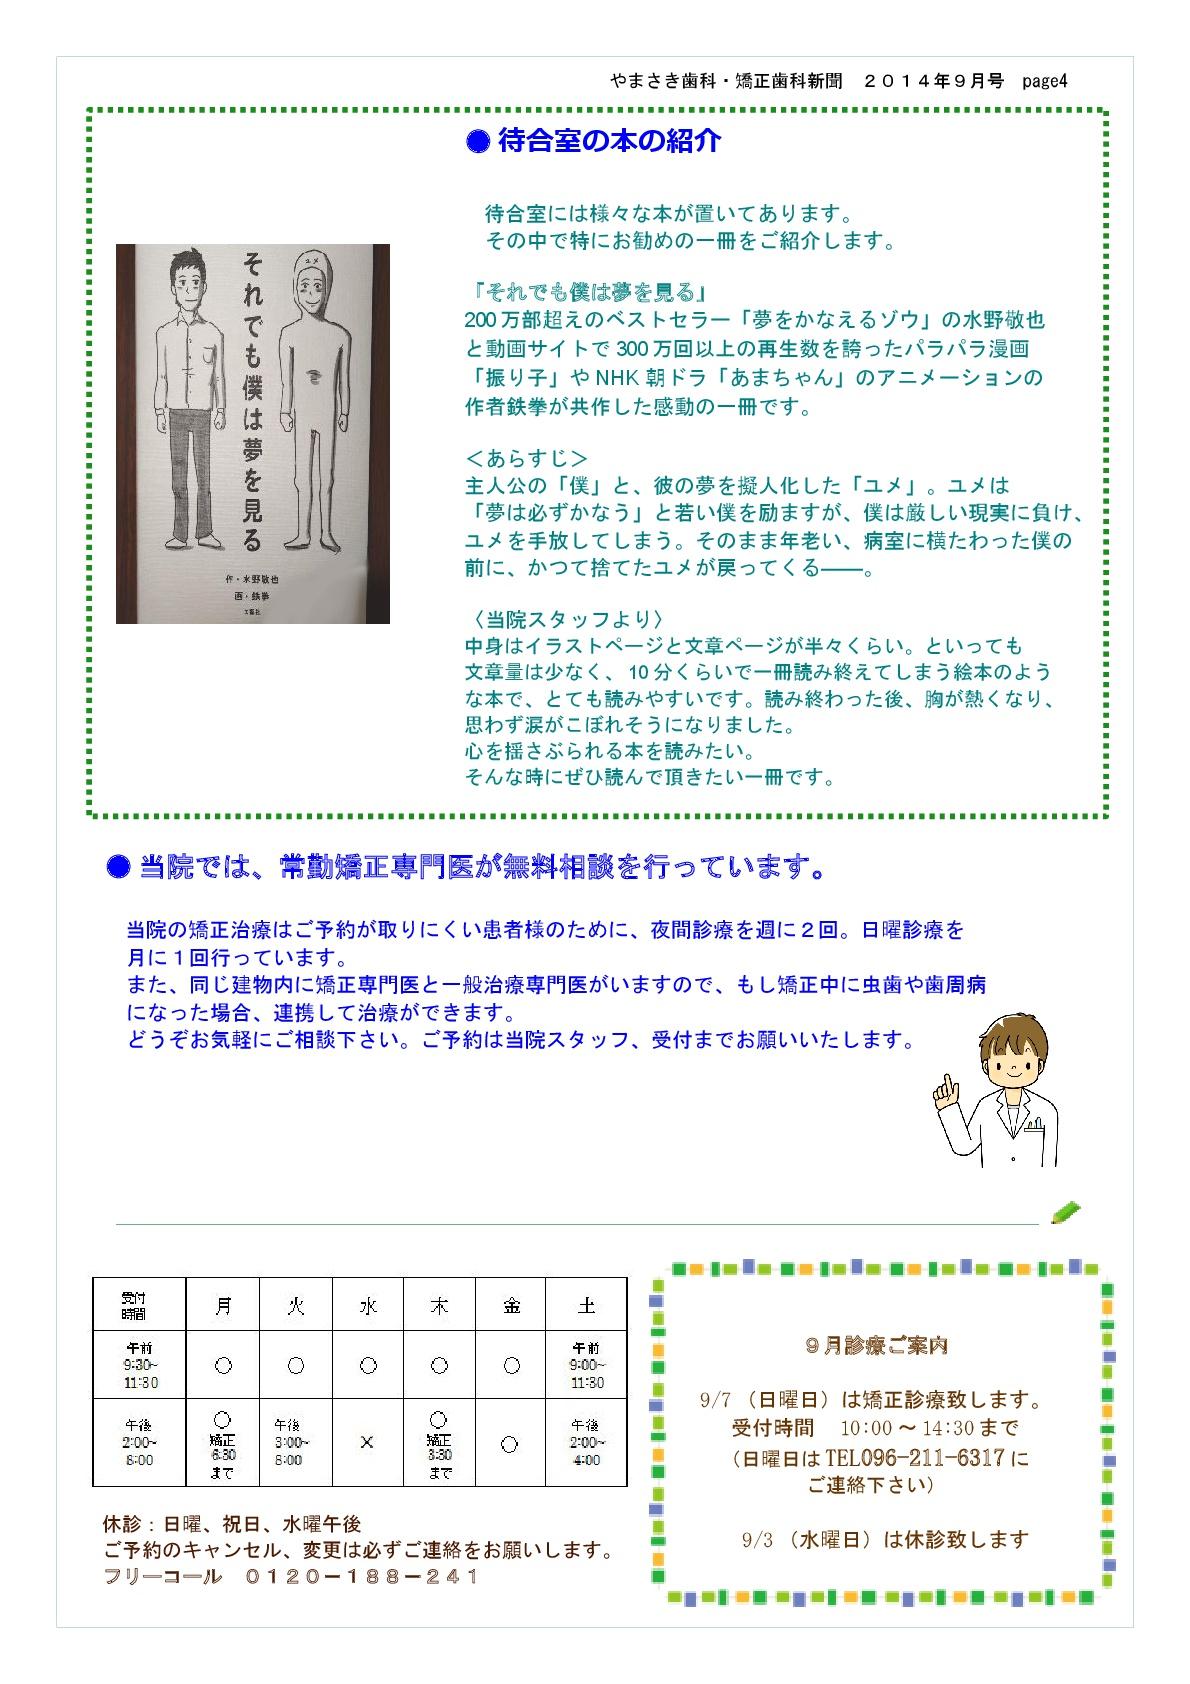 sinbun14-9-2-003